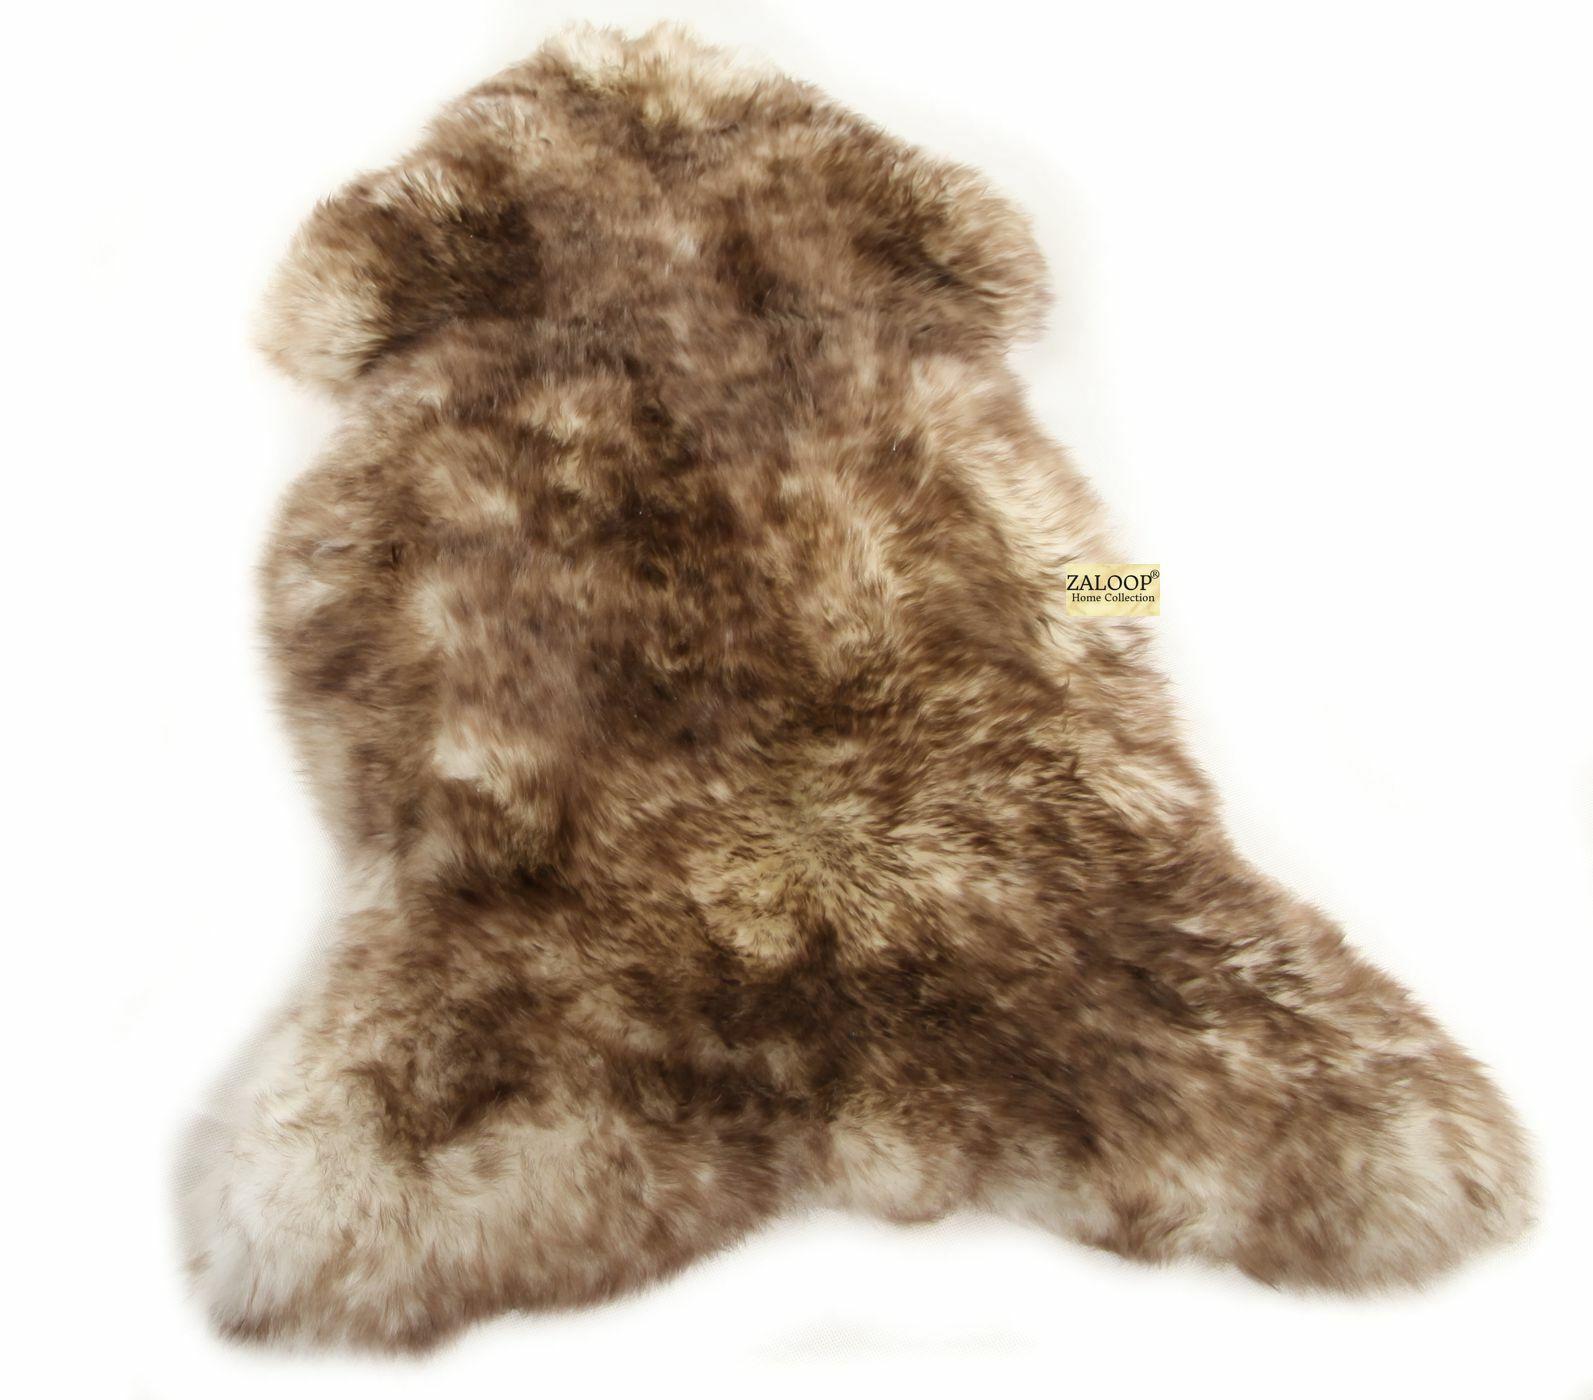 Lammfell Schaffell Schaffell Schaffell dunkel geflammt echtes Öko Fell Teppich Naturfell ökologisch   ein guter Ruf in der Welt  3edcf1